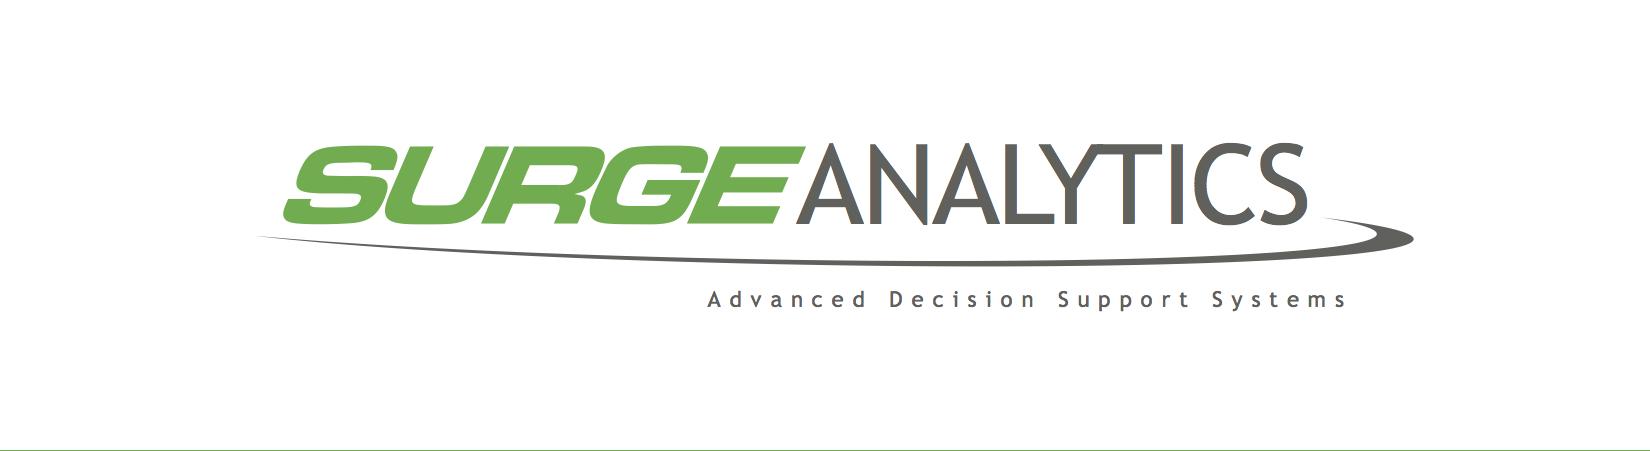 Surge Analytics, LLC